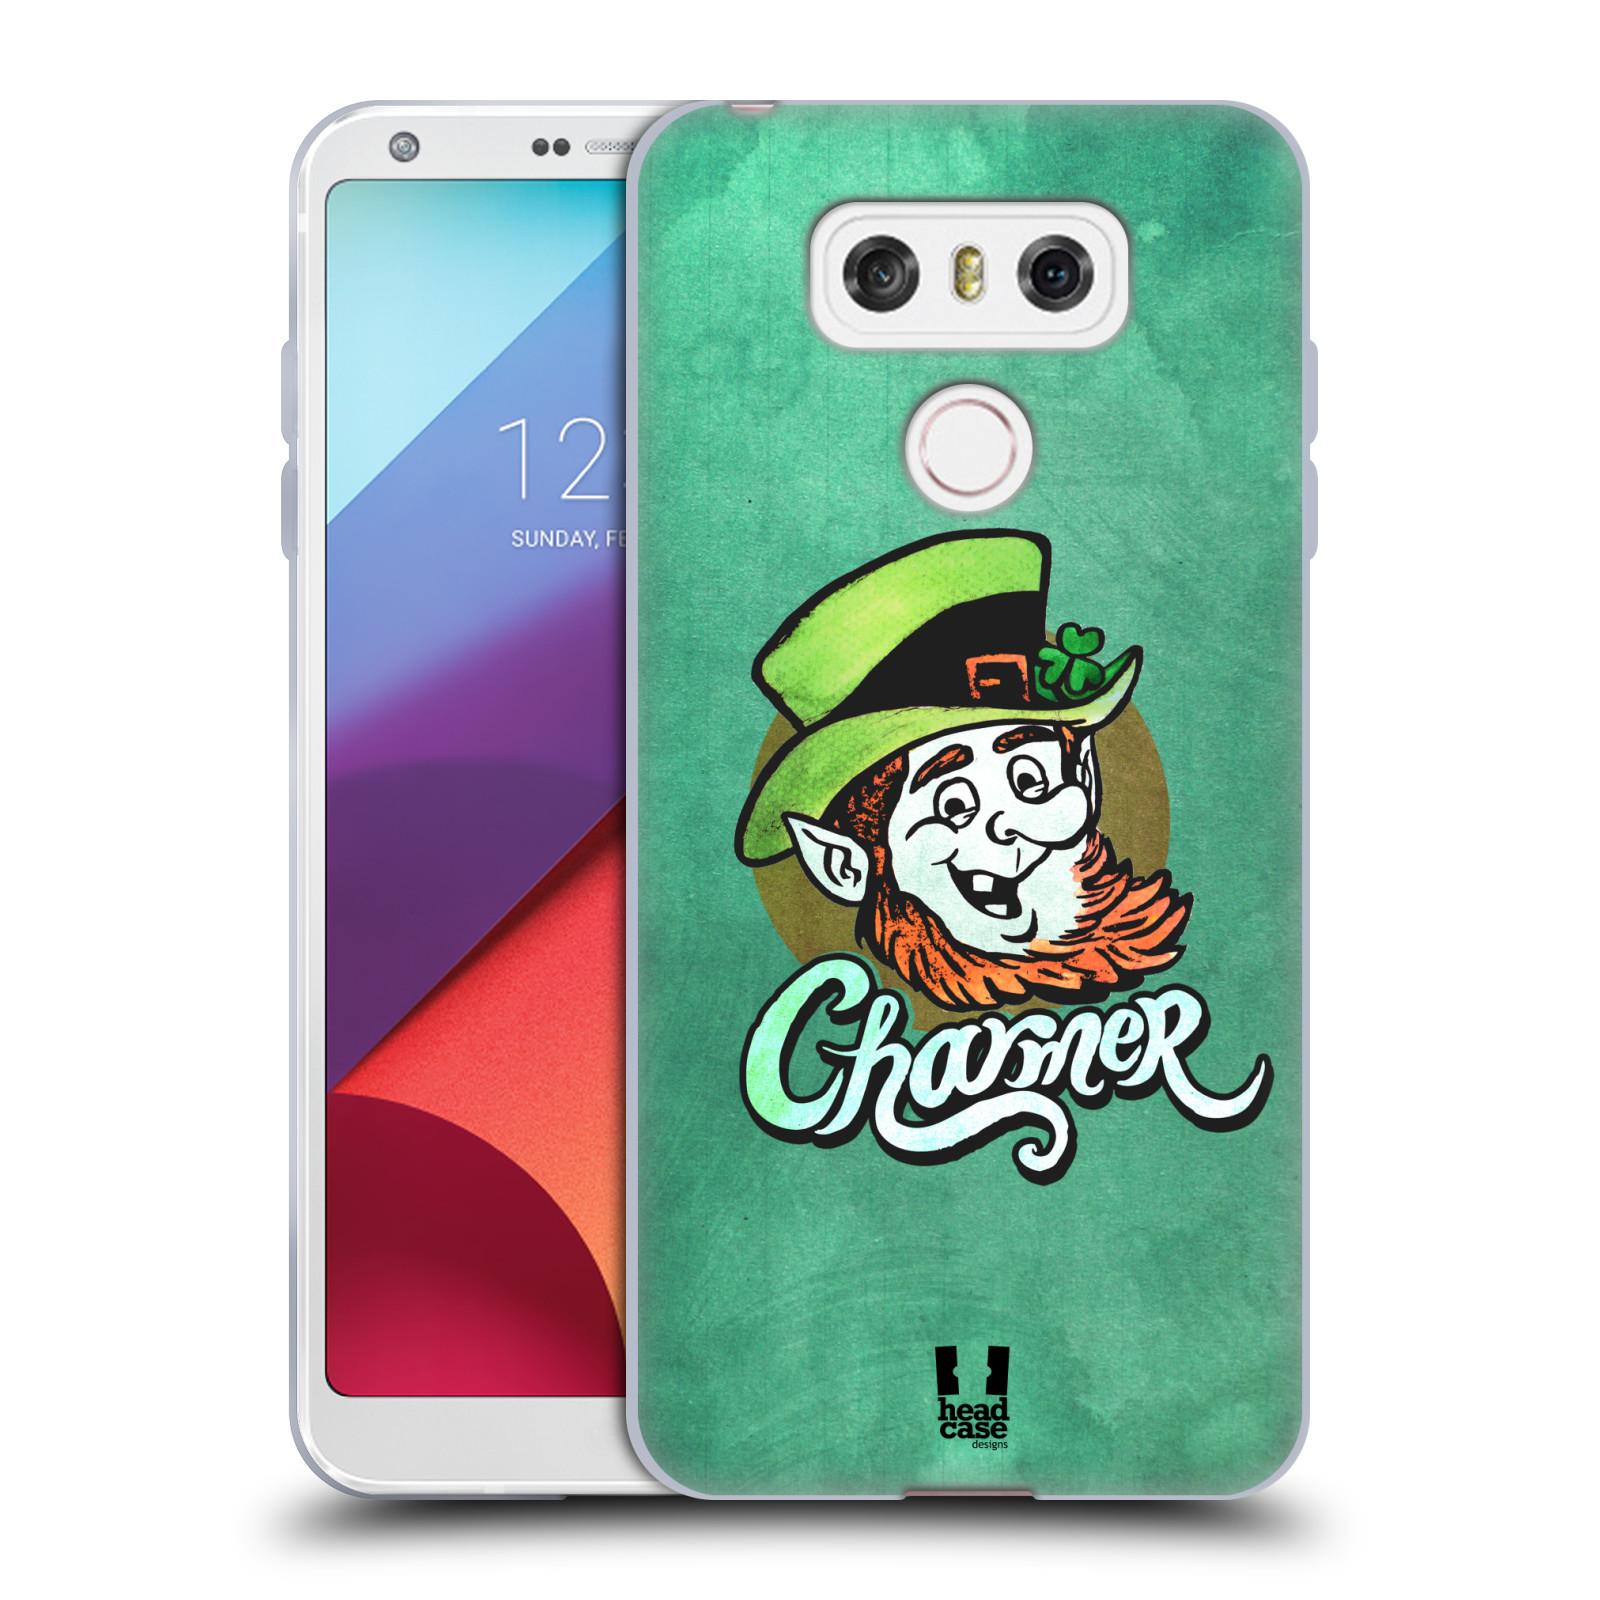 Silikonové pouzdro na mobil LG G6 - Head Case CHARMER (Silikonový kryt či obal na mobilní telefon LG G6 H870 / LG G6 Dual SIM H870DS)